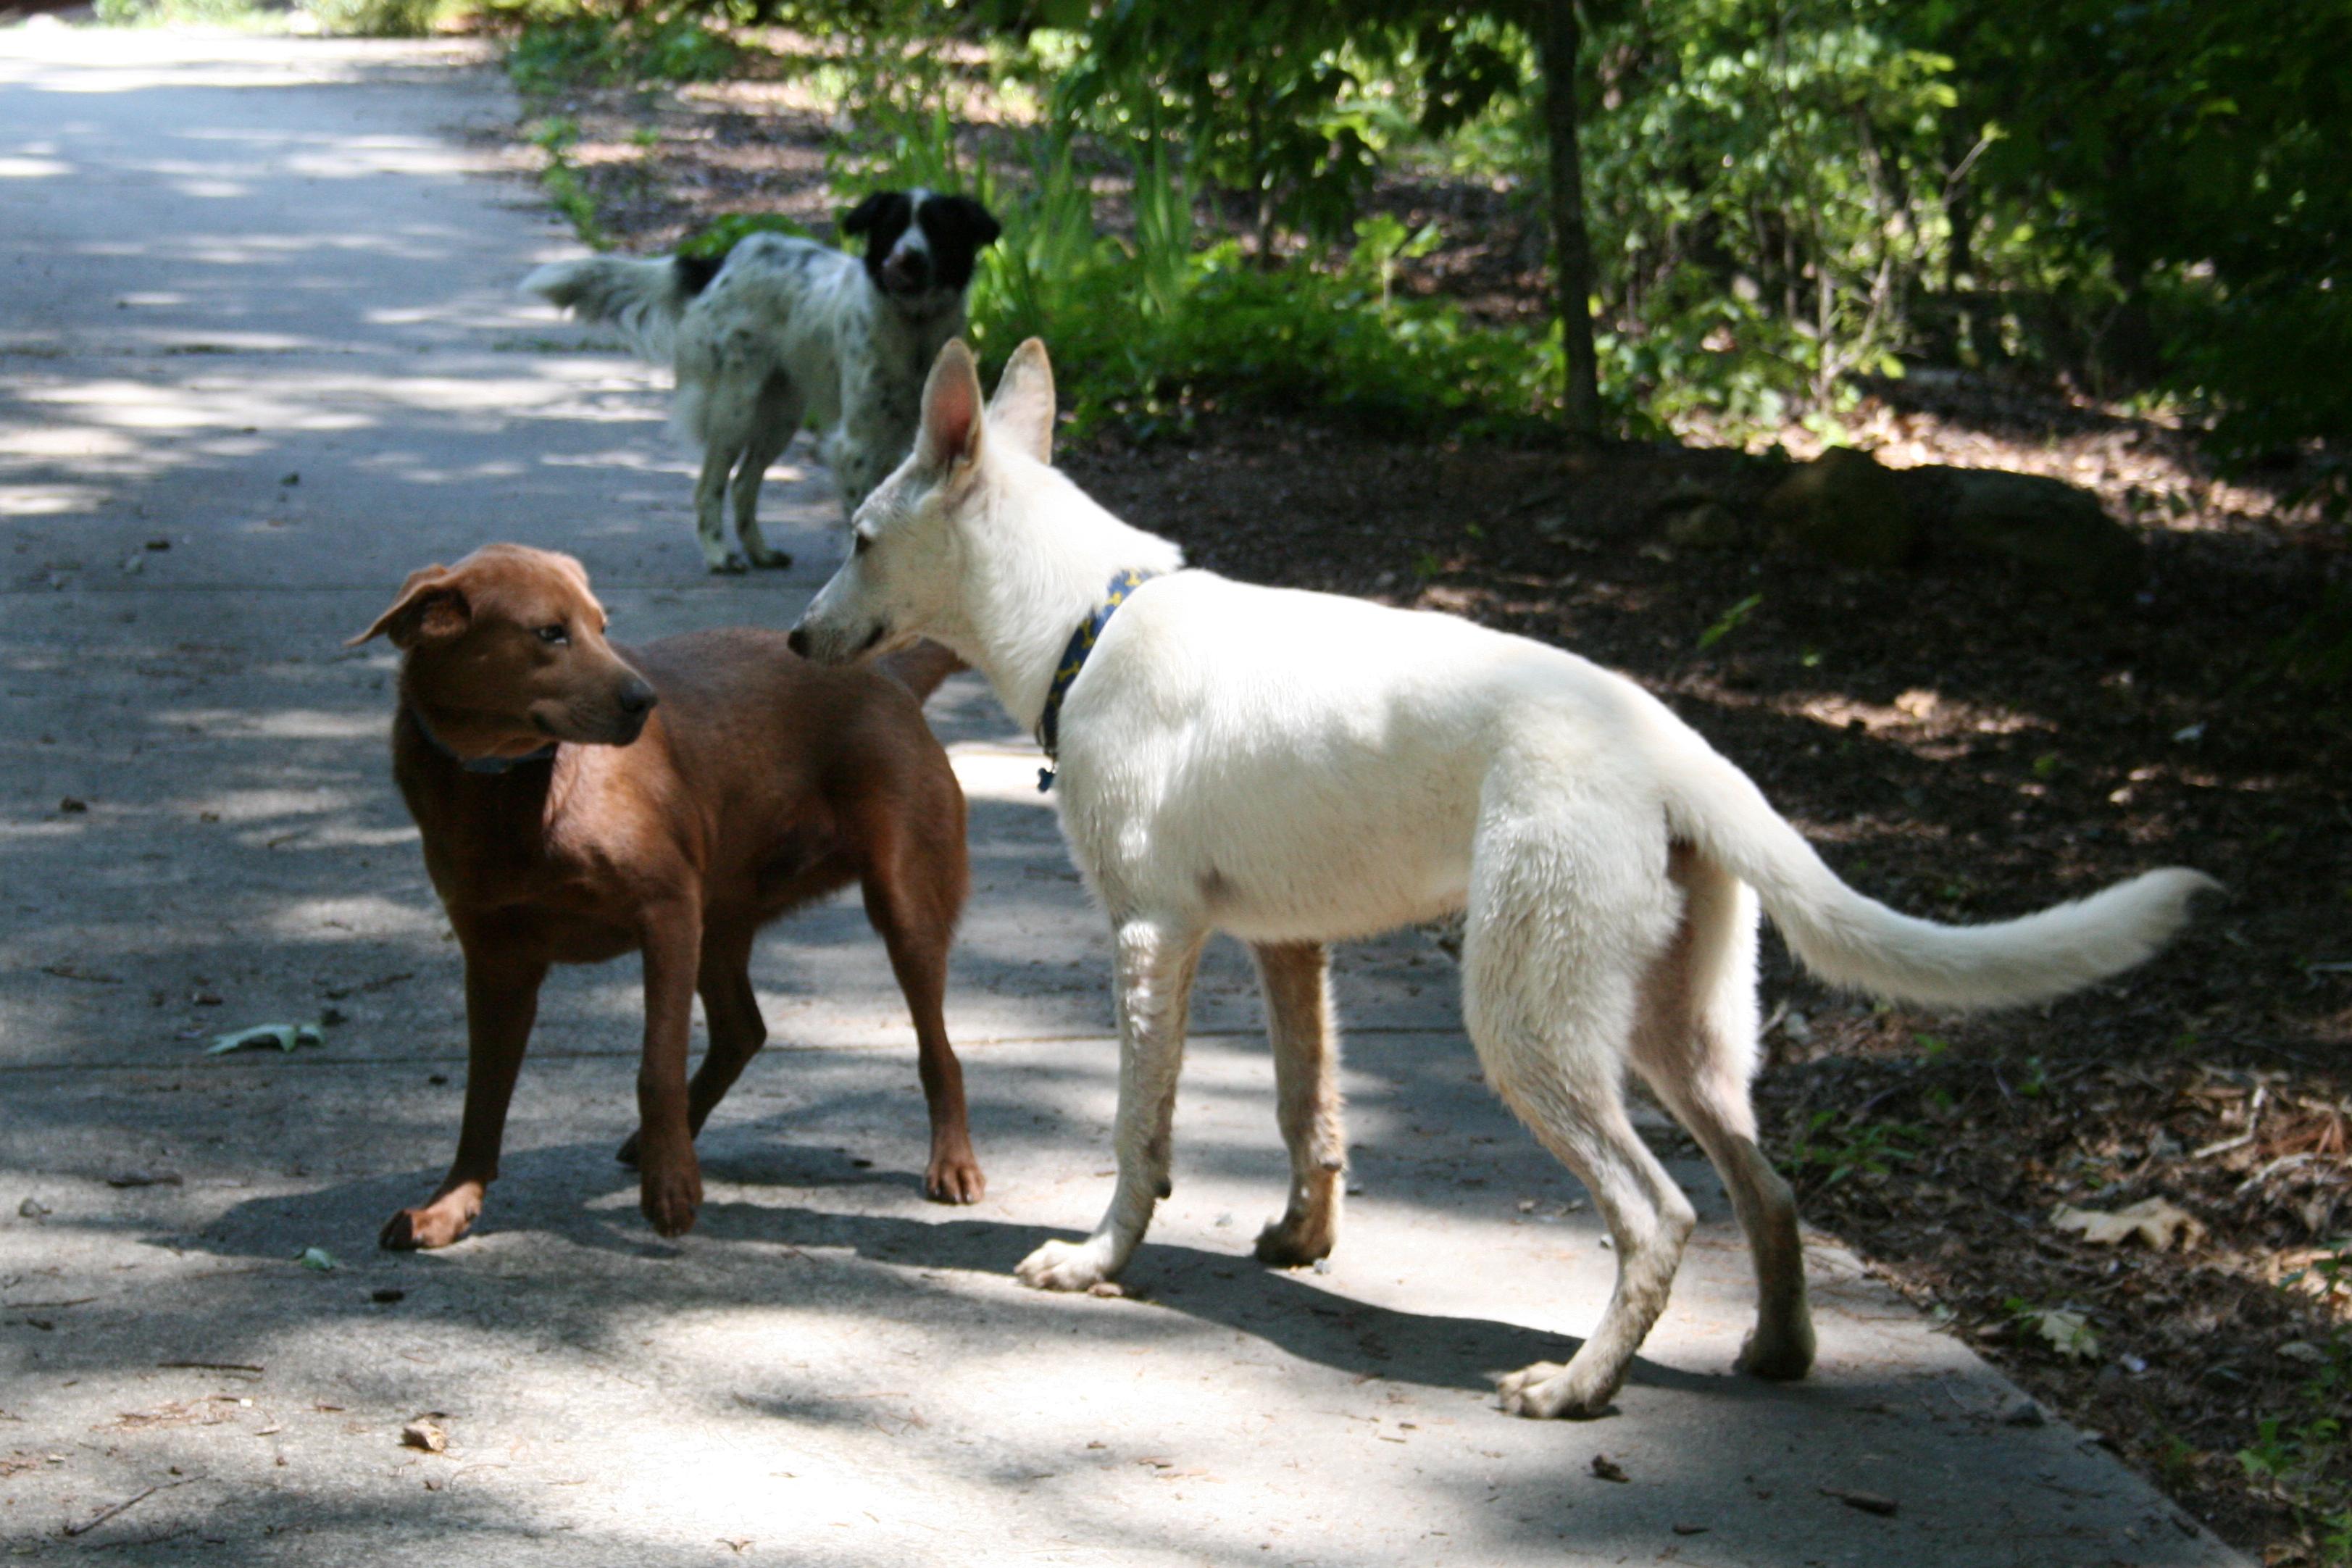 File 2008 06 18 Dogs Meeting Jpg Wikimedia Commons